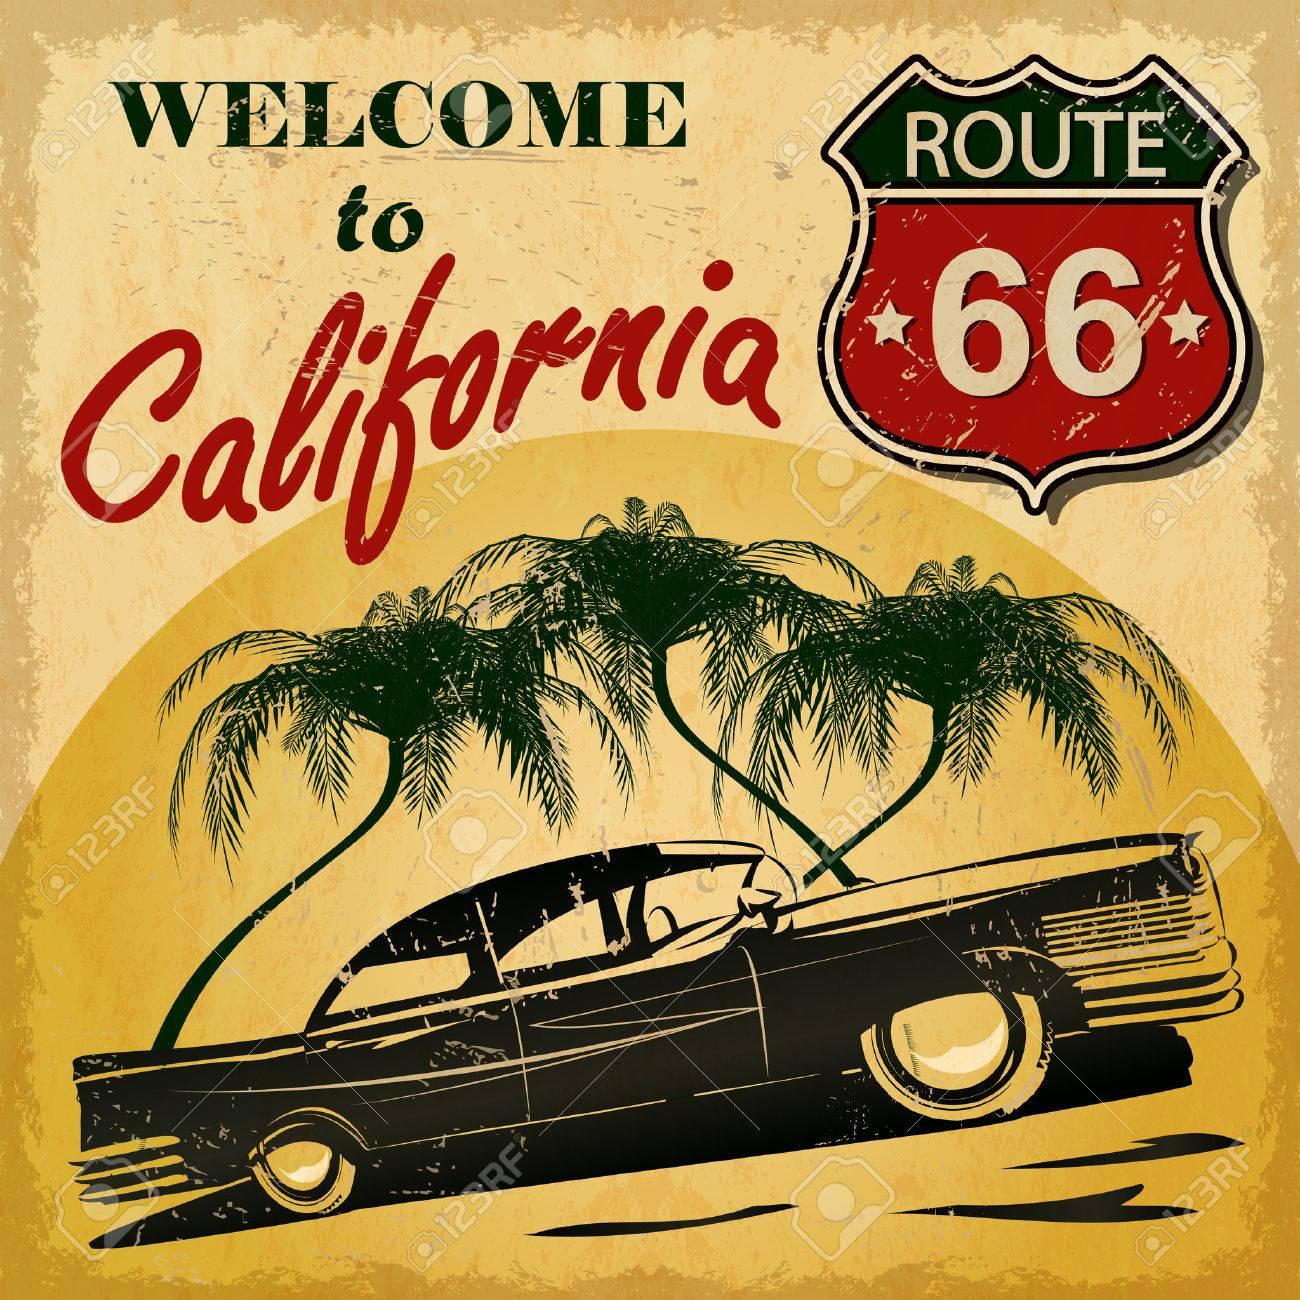 Welcome to California retro poster. - 50143025